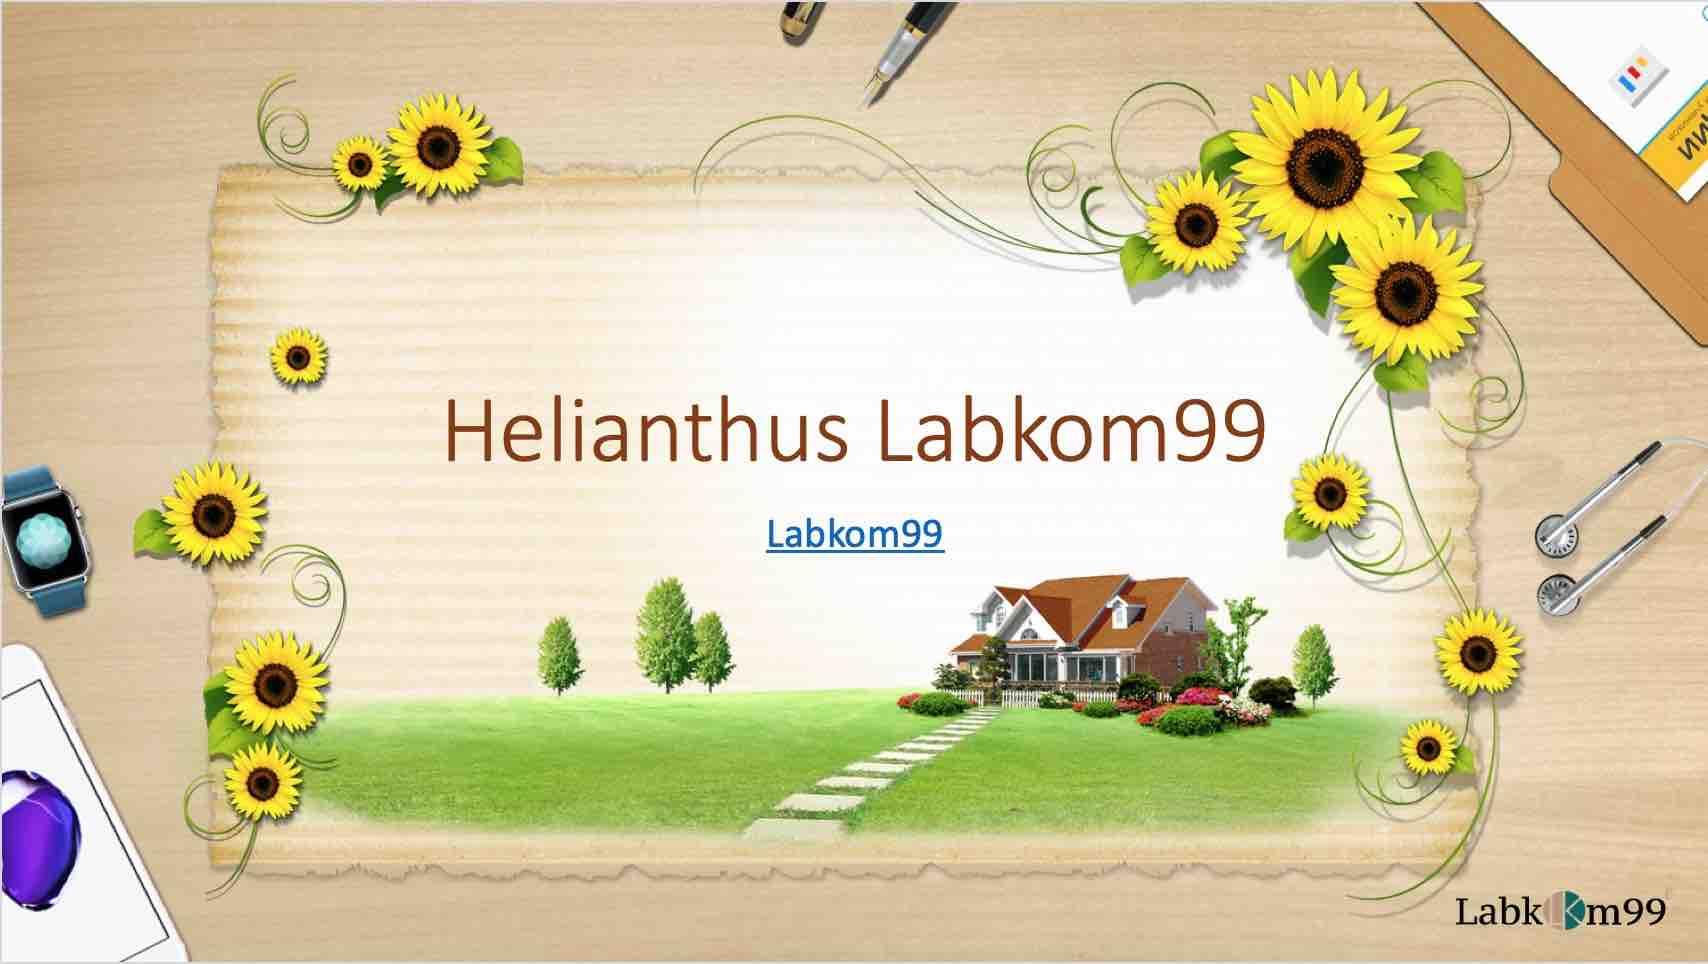 Helianthus - Labkom99